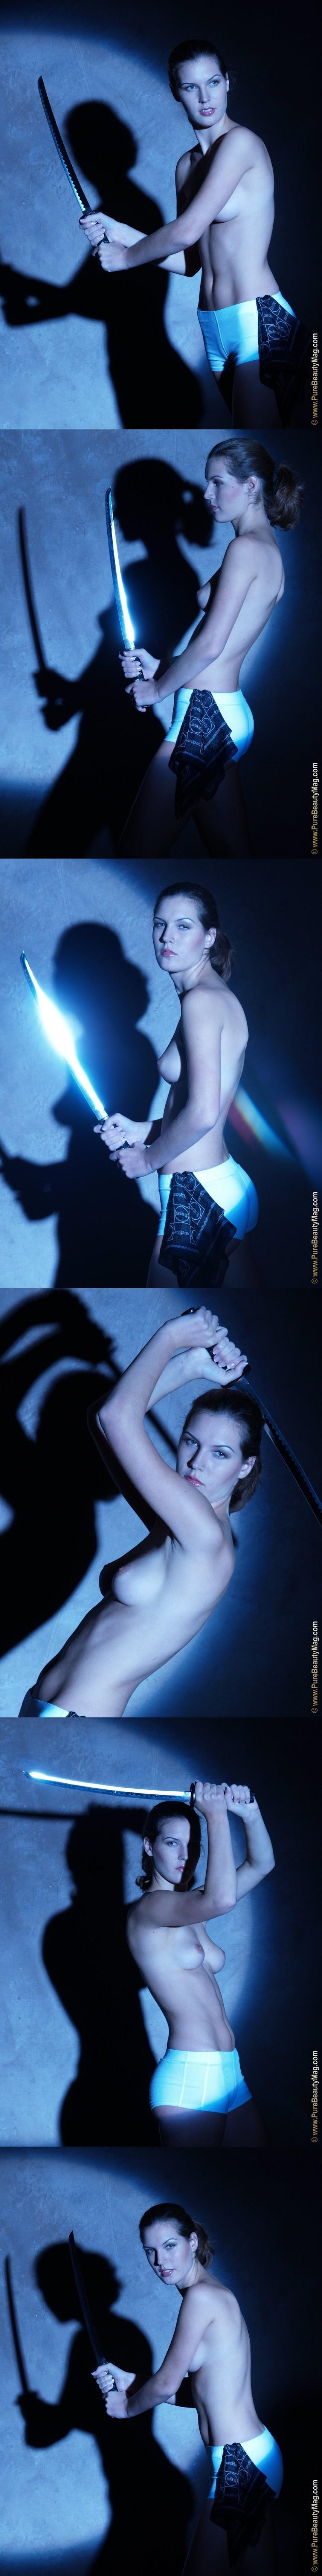 PureBeautyMag PBM  - 2005-09-18 -  s118684 - Lucie T - Moon Light - 2560px